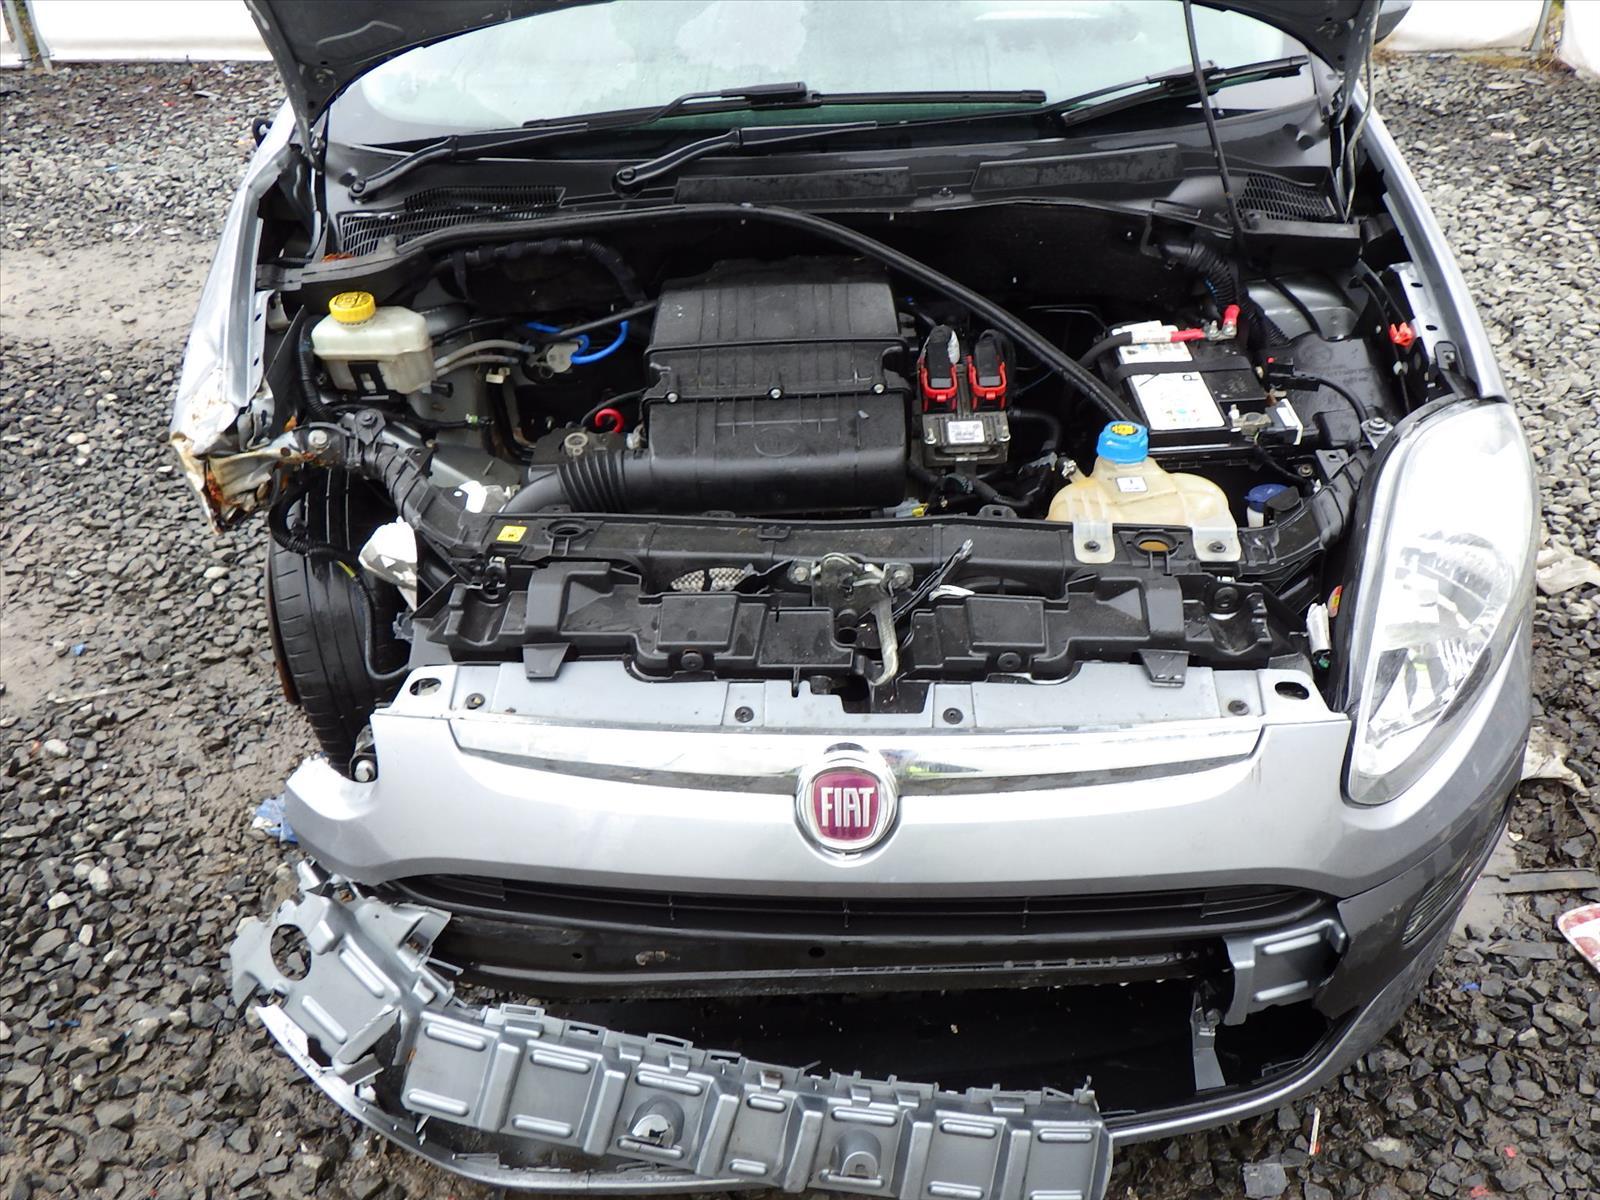 2010 Fiat Punto Active 5 Door Hatchback (Petrol / Manual) breaking Fiat Punto Spare Part on fiat 126 parts, audi tt parts, isuzu trooper parts, porsche 911 parts, honda fit parts, fiat barchetta parts, fiat seicento parts, fiat palio parts, peugeot 405 parts, mini parts, mazda rx-7 parts, citroen xantia parts, fiat uno parts, vw golf parts, toyota yaris parts, ford focus parts, fiat brava parts, ford fusion parts, fiat 500 parts, audi a4 parts,